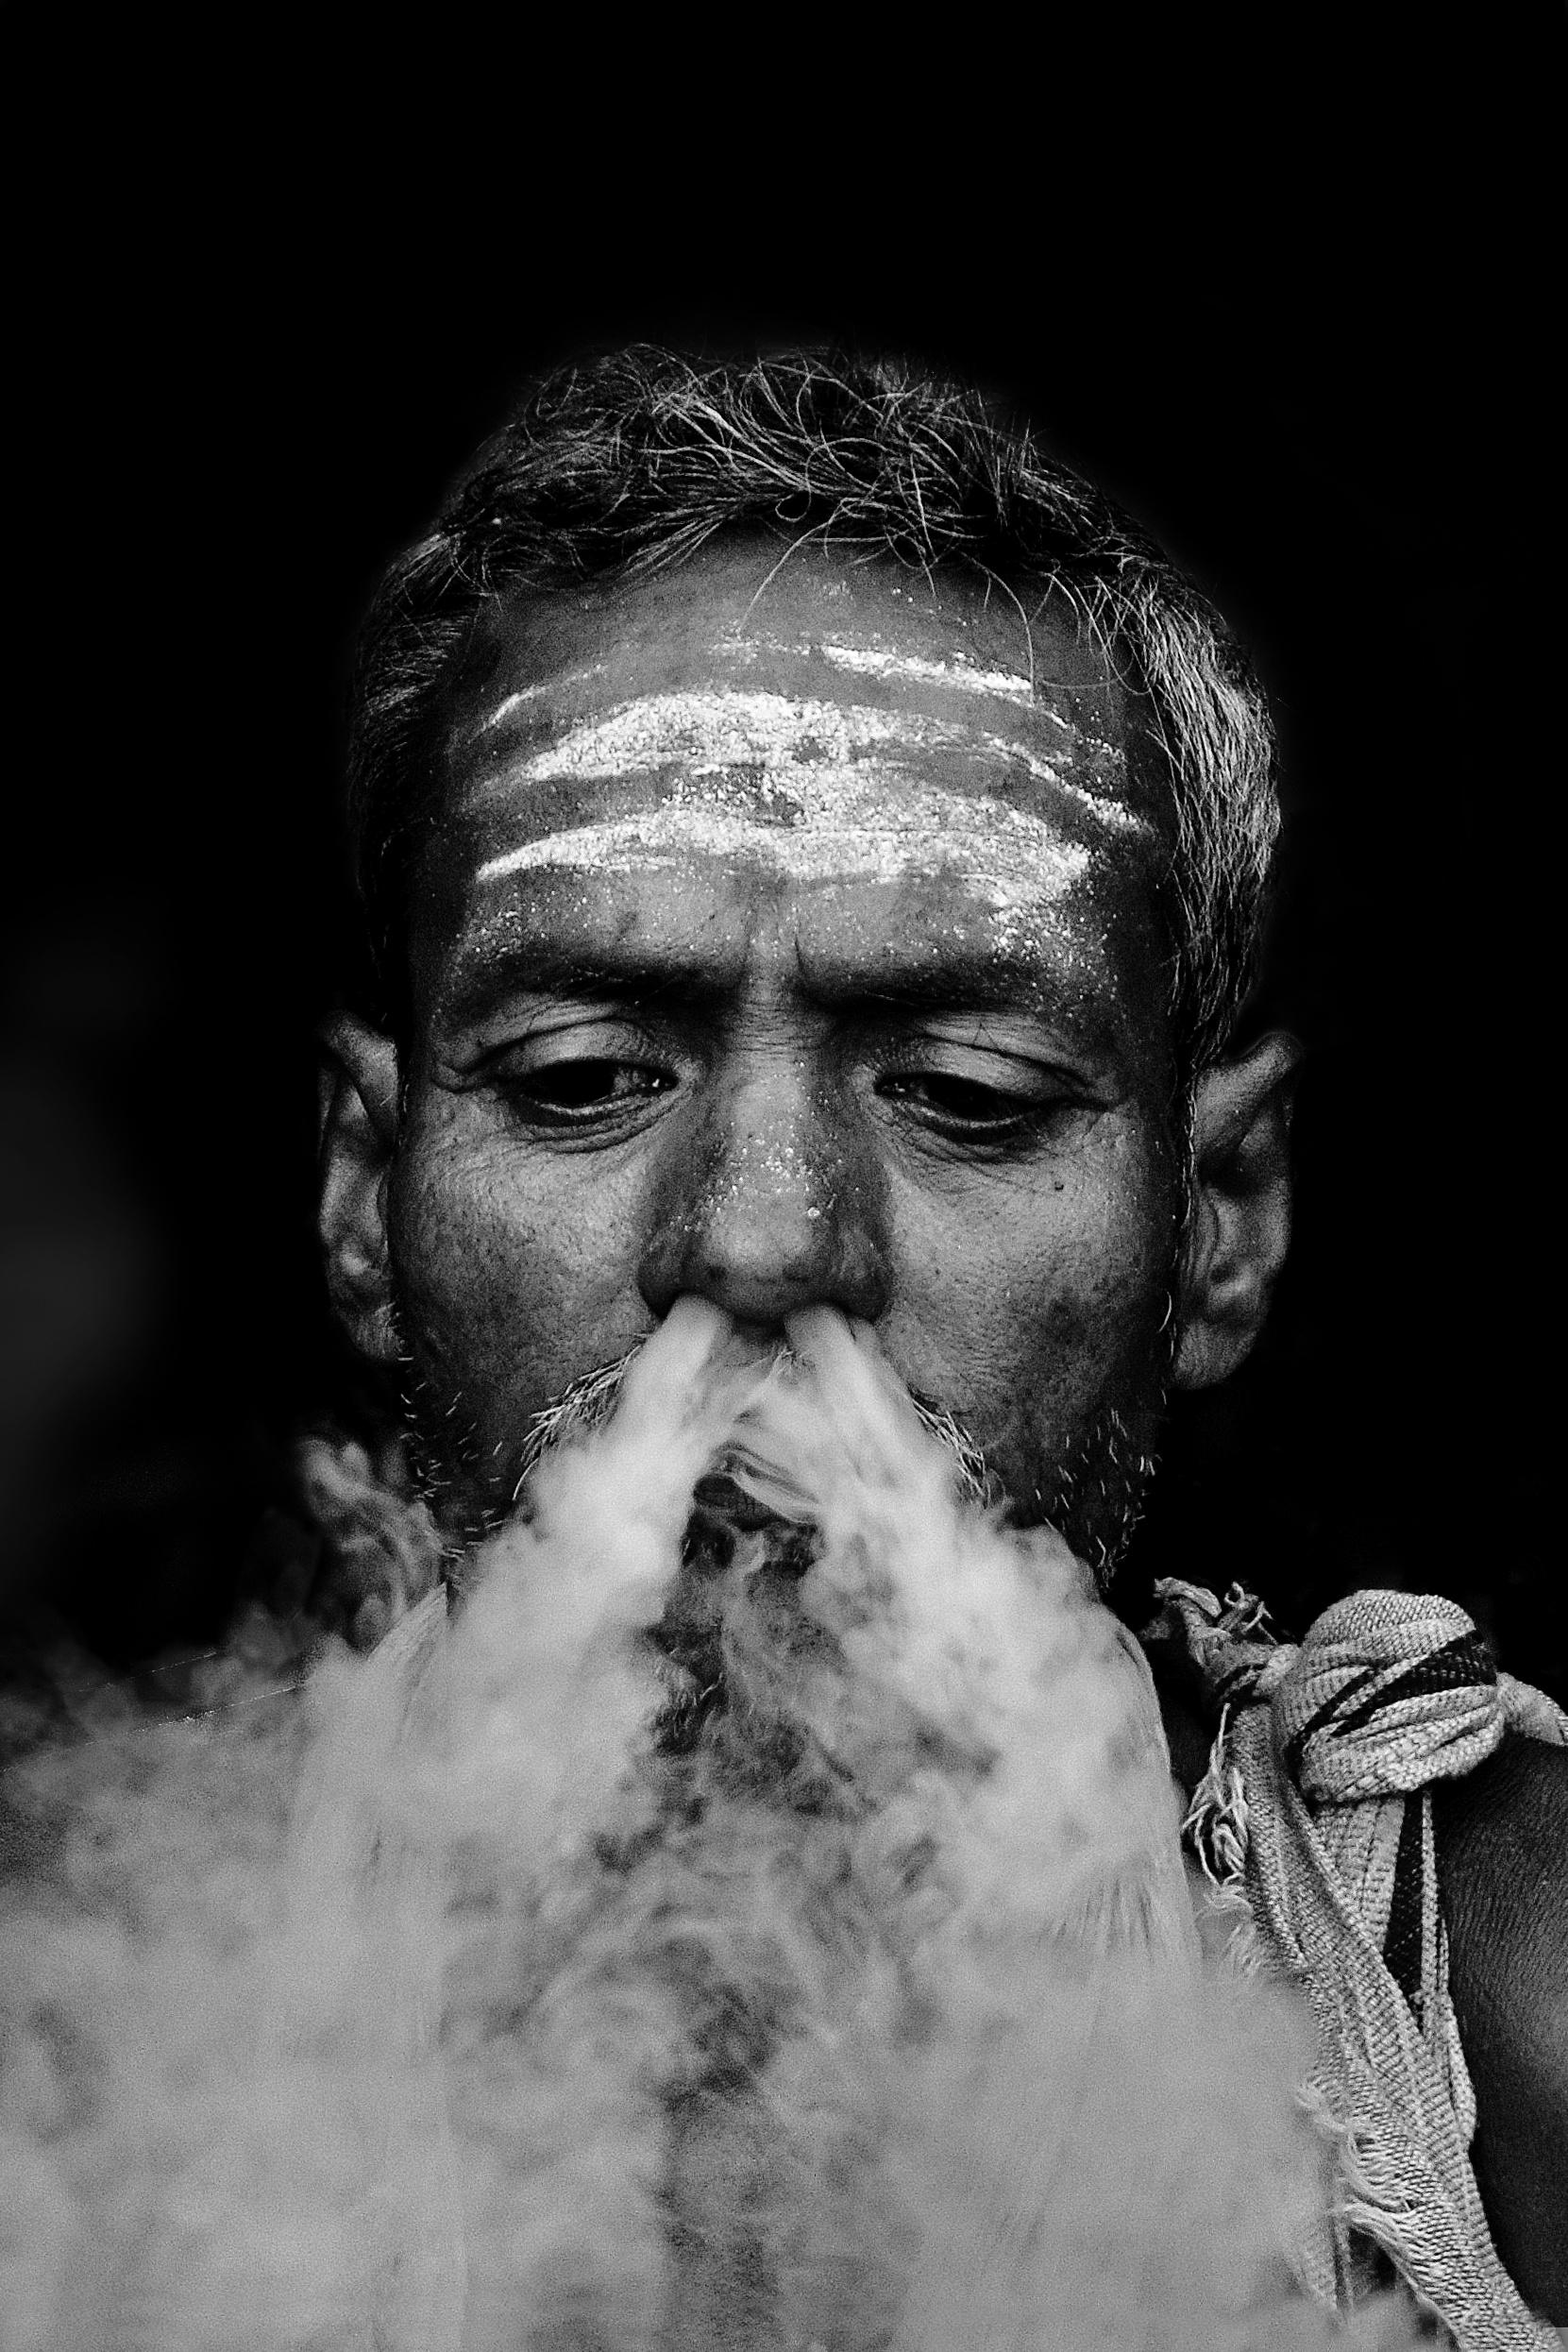 A sadhu smoking on the street.